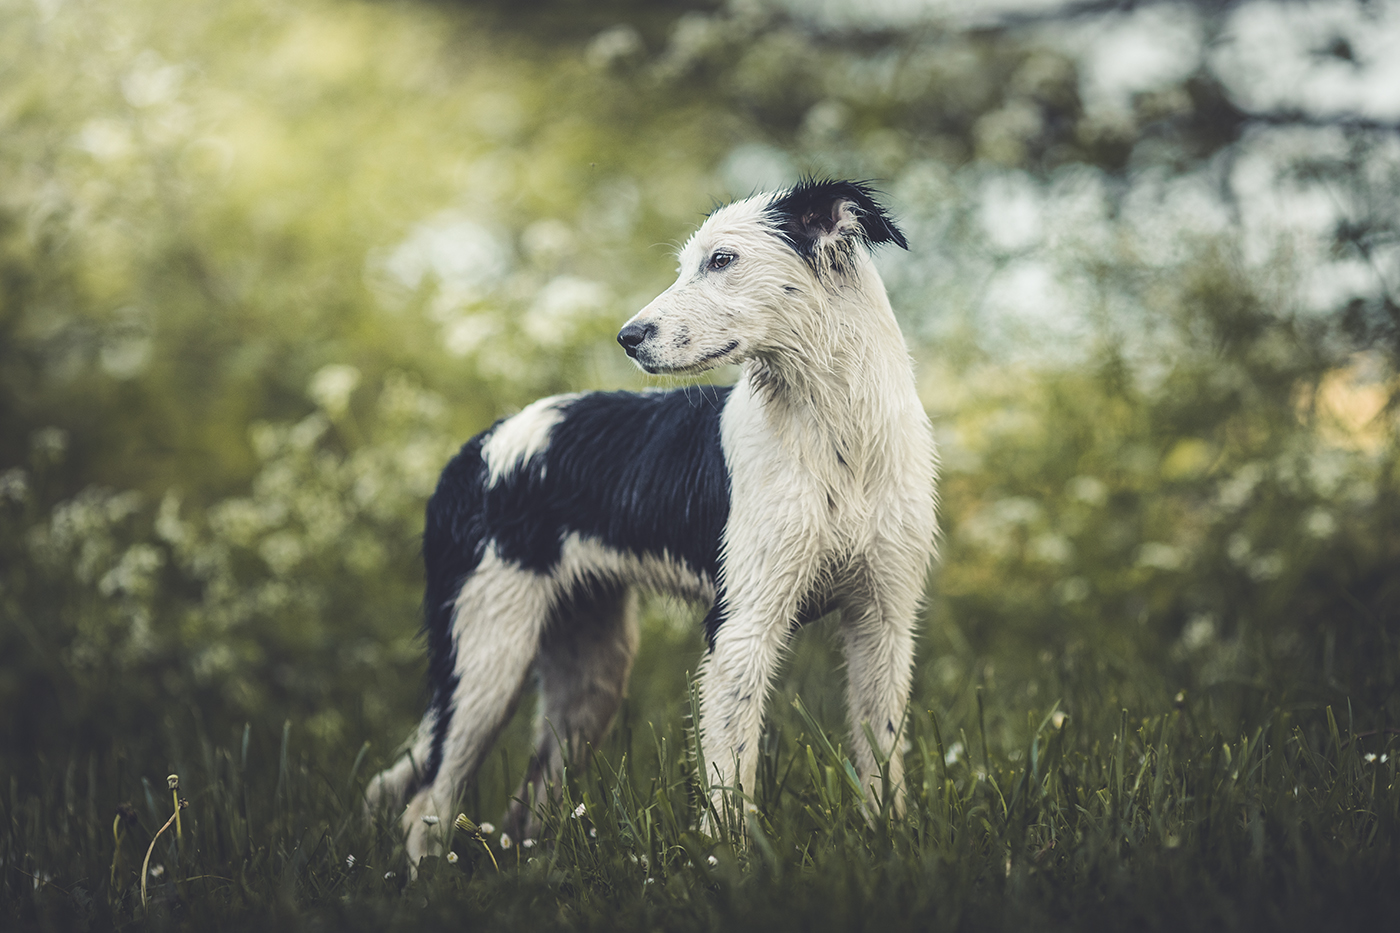 photographe-animalier-chien-Canin-poitiers-guillaume-heraud-16